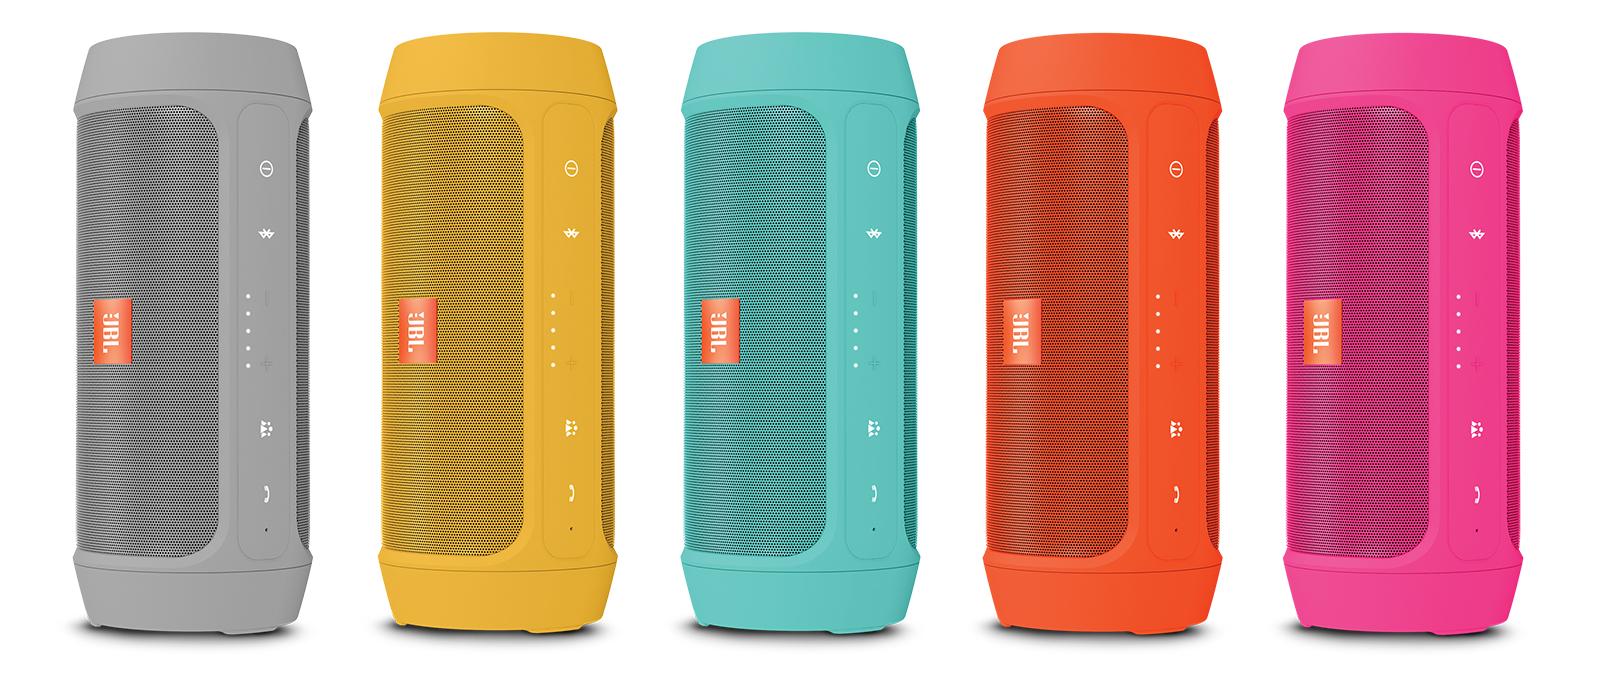 jbl-charge-2-plus-portable-speaker-colors.jpg